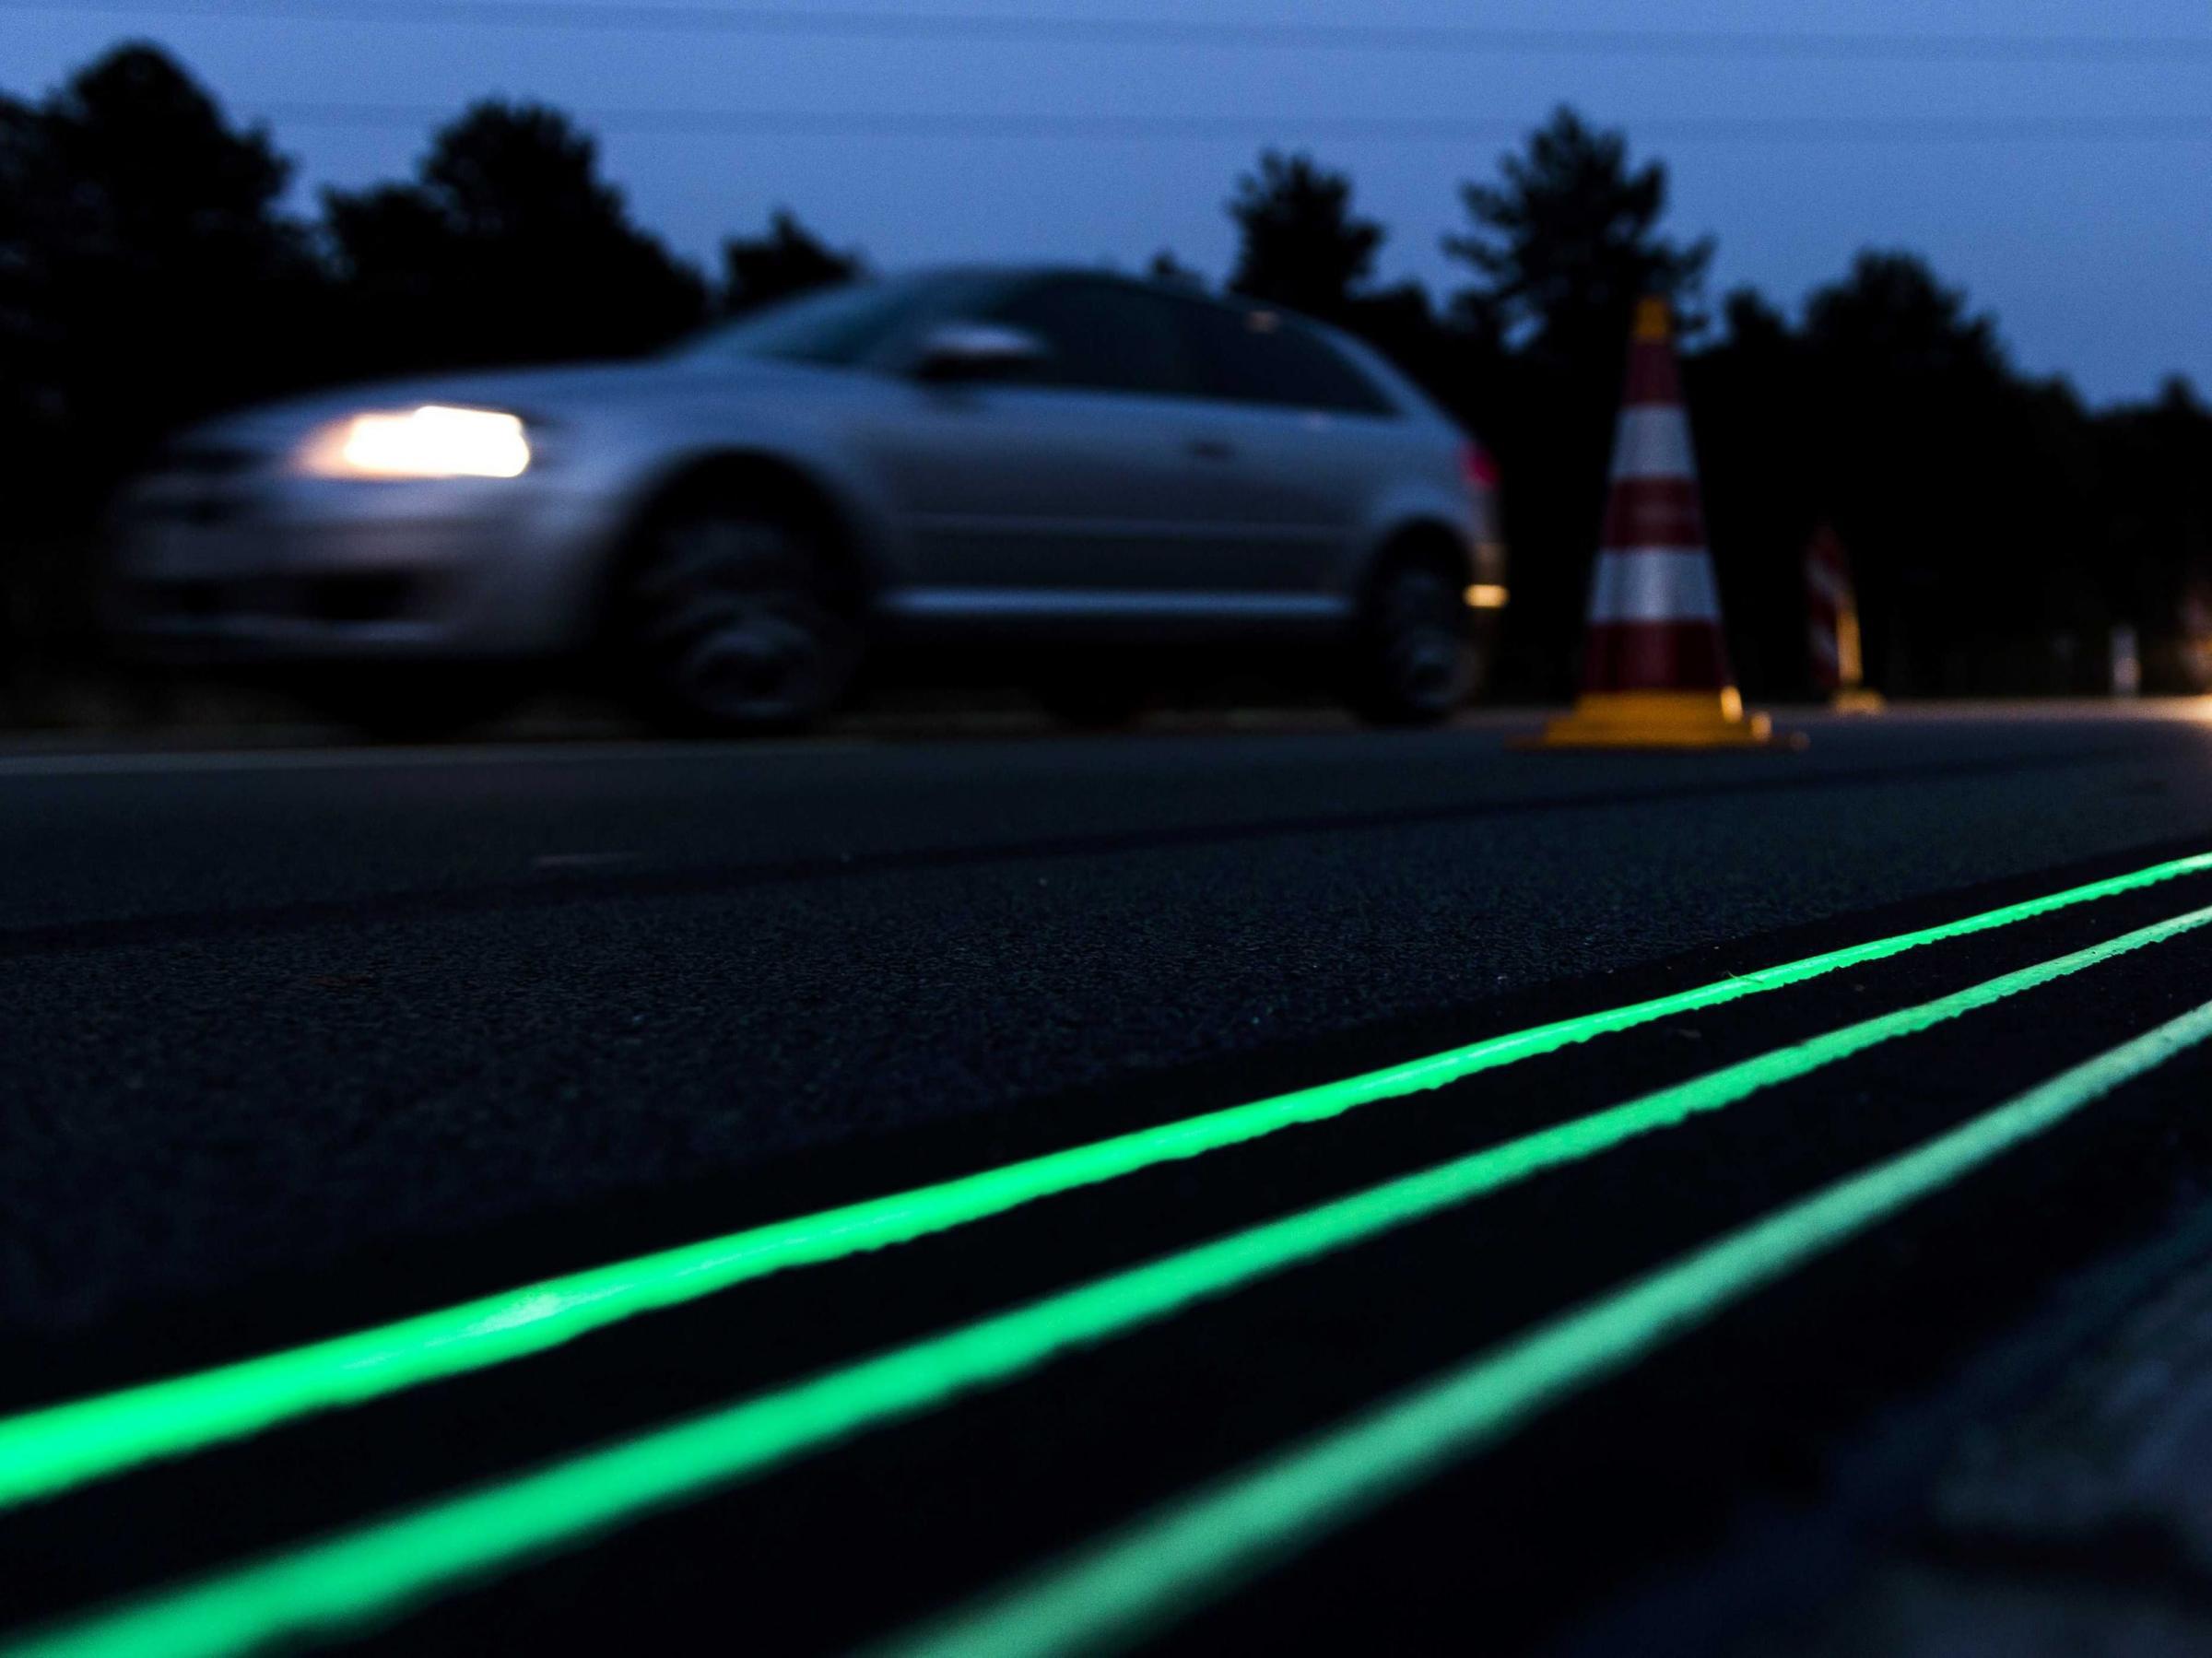 Dutch Test Glow In The Dark Road Of The Future